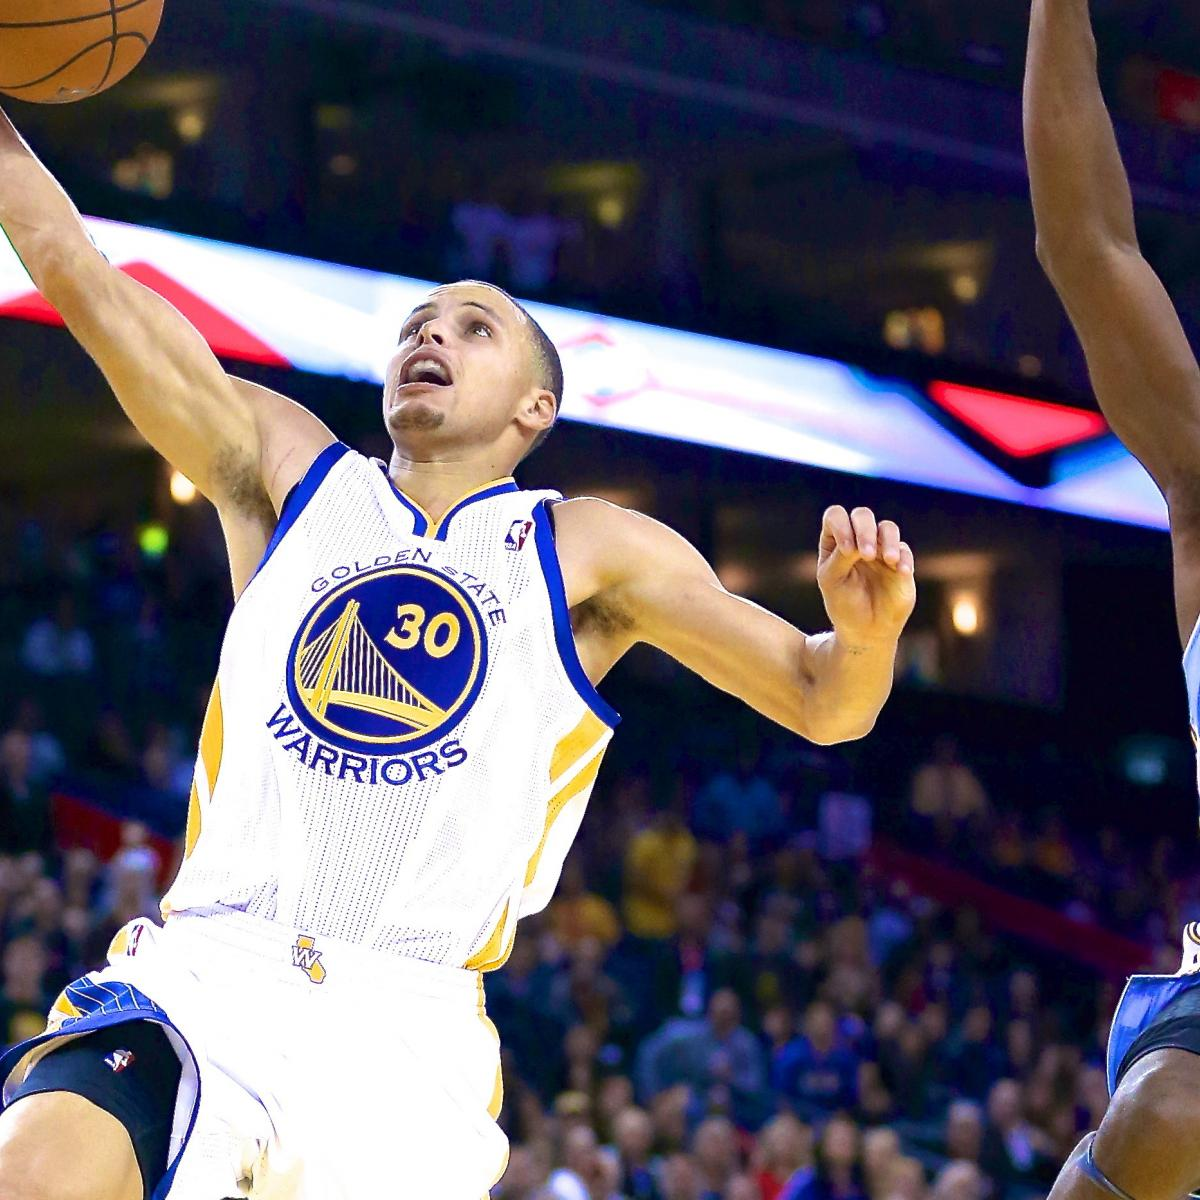 Denver Nuggets Vs. G.S. Warriors: Game 3 Live Score